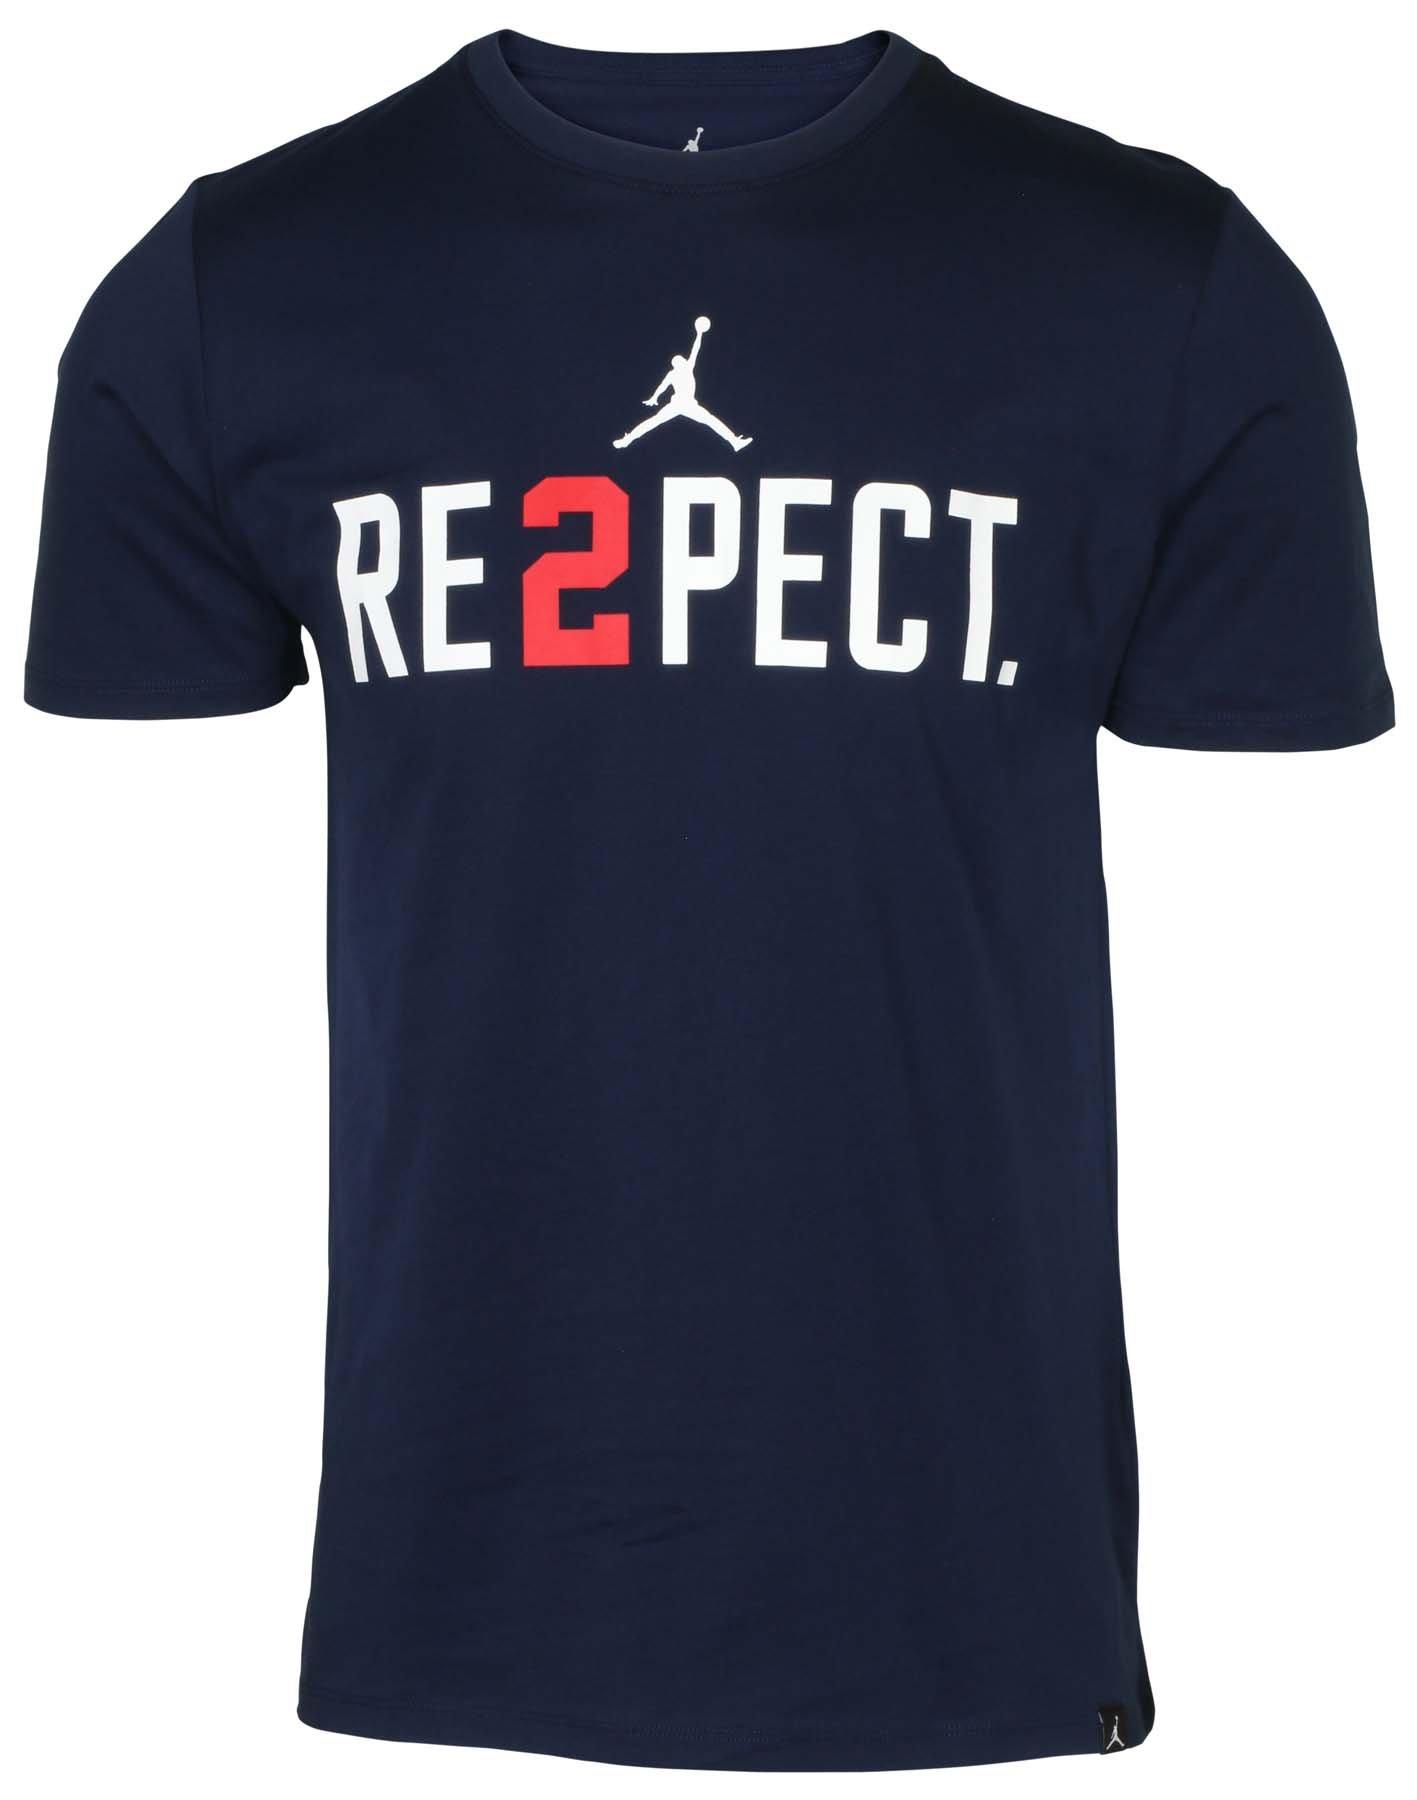 NIKE Jordan Men's Jeter Re2pect Training T-Shirt-Navy-Medium